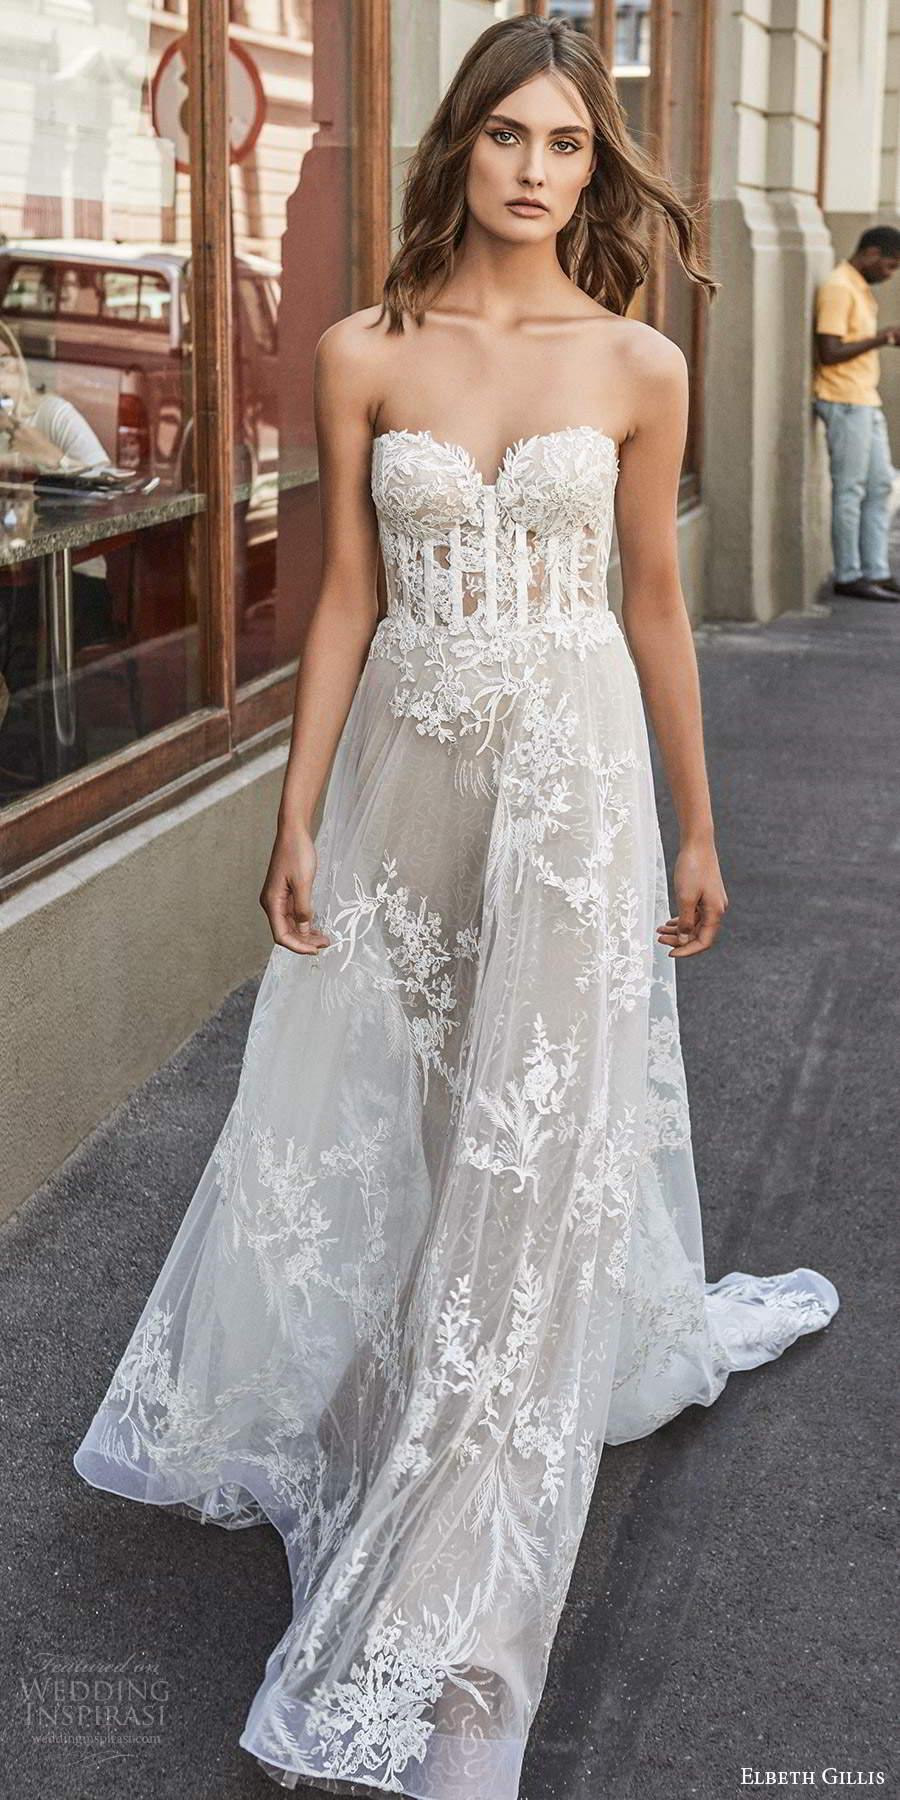 elbeth gillis 2021 bridal strapless sweetheart neckline embellished lace a line ball gown wedding dress chapel train (4) mv